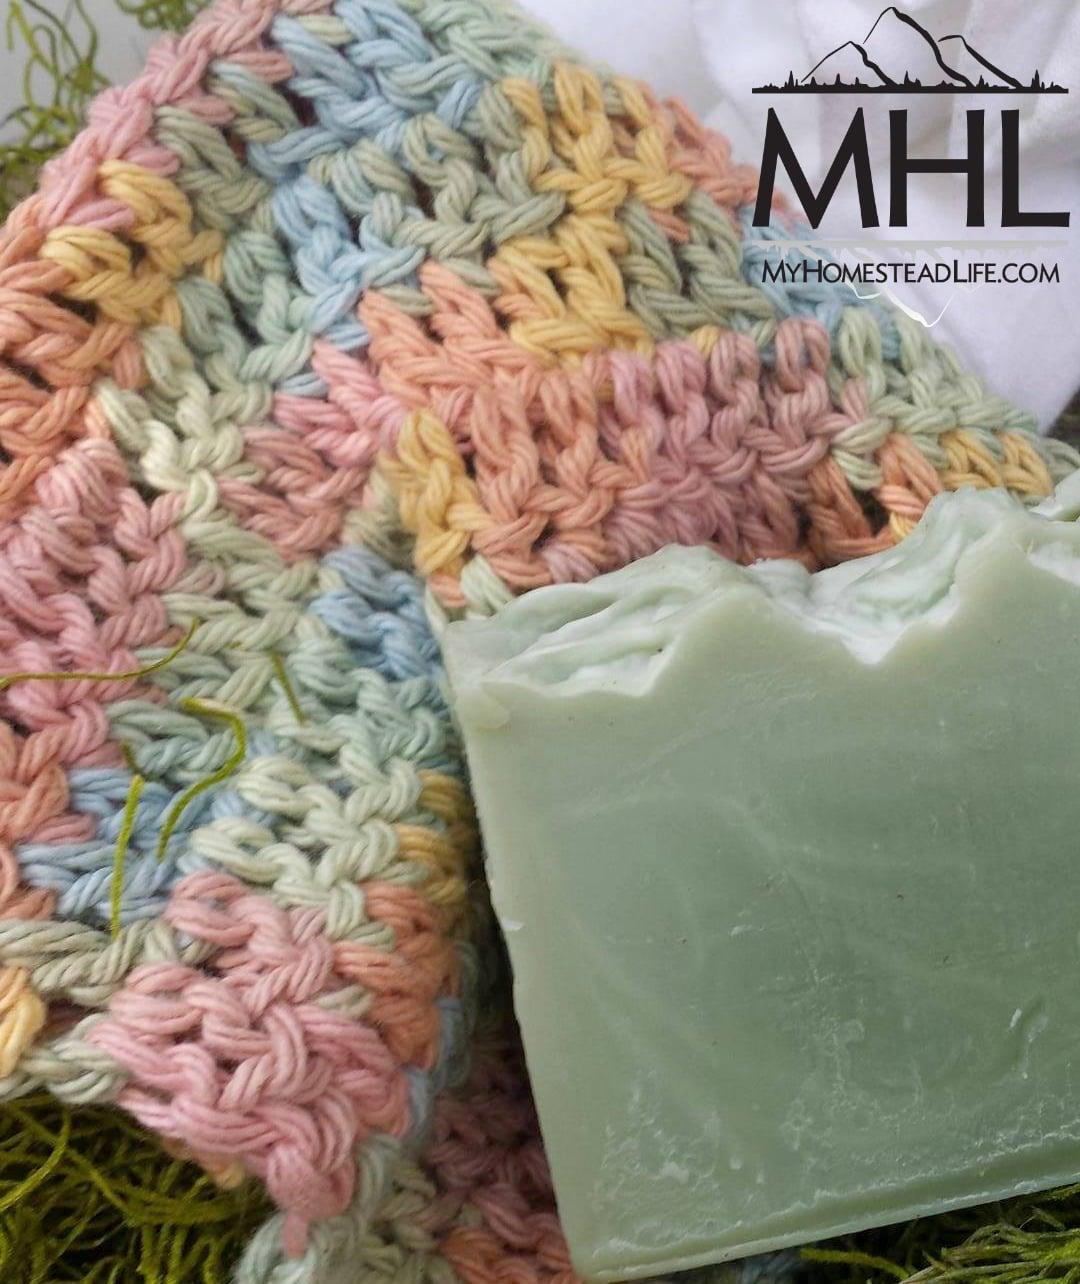 100% Cotton Handmade Spa Washcloth- Multi Color - My Homestead Life